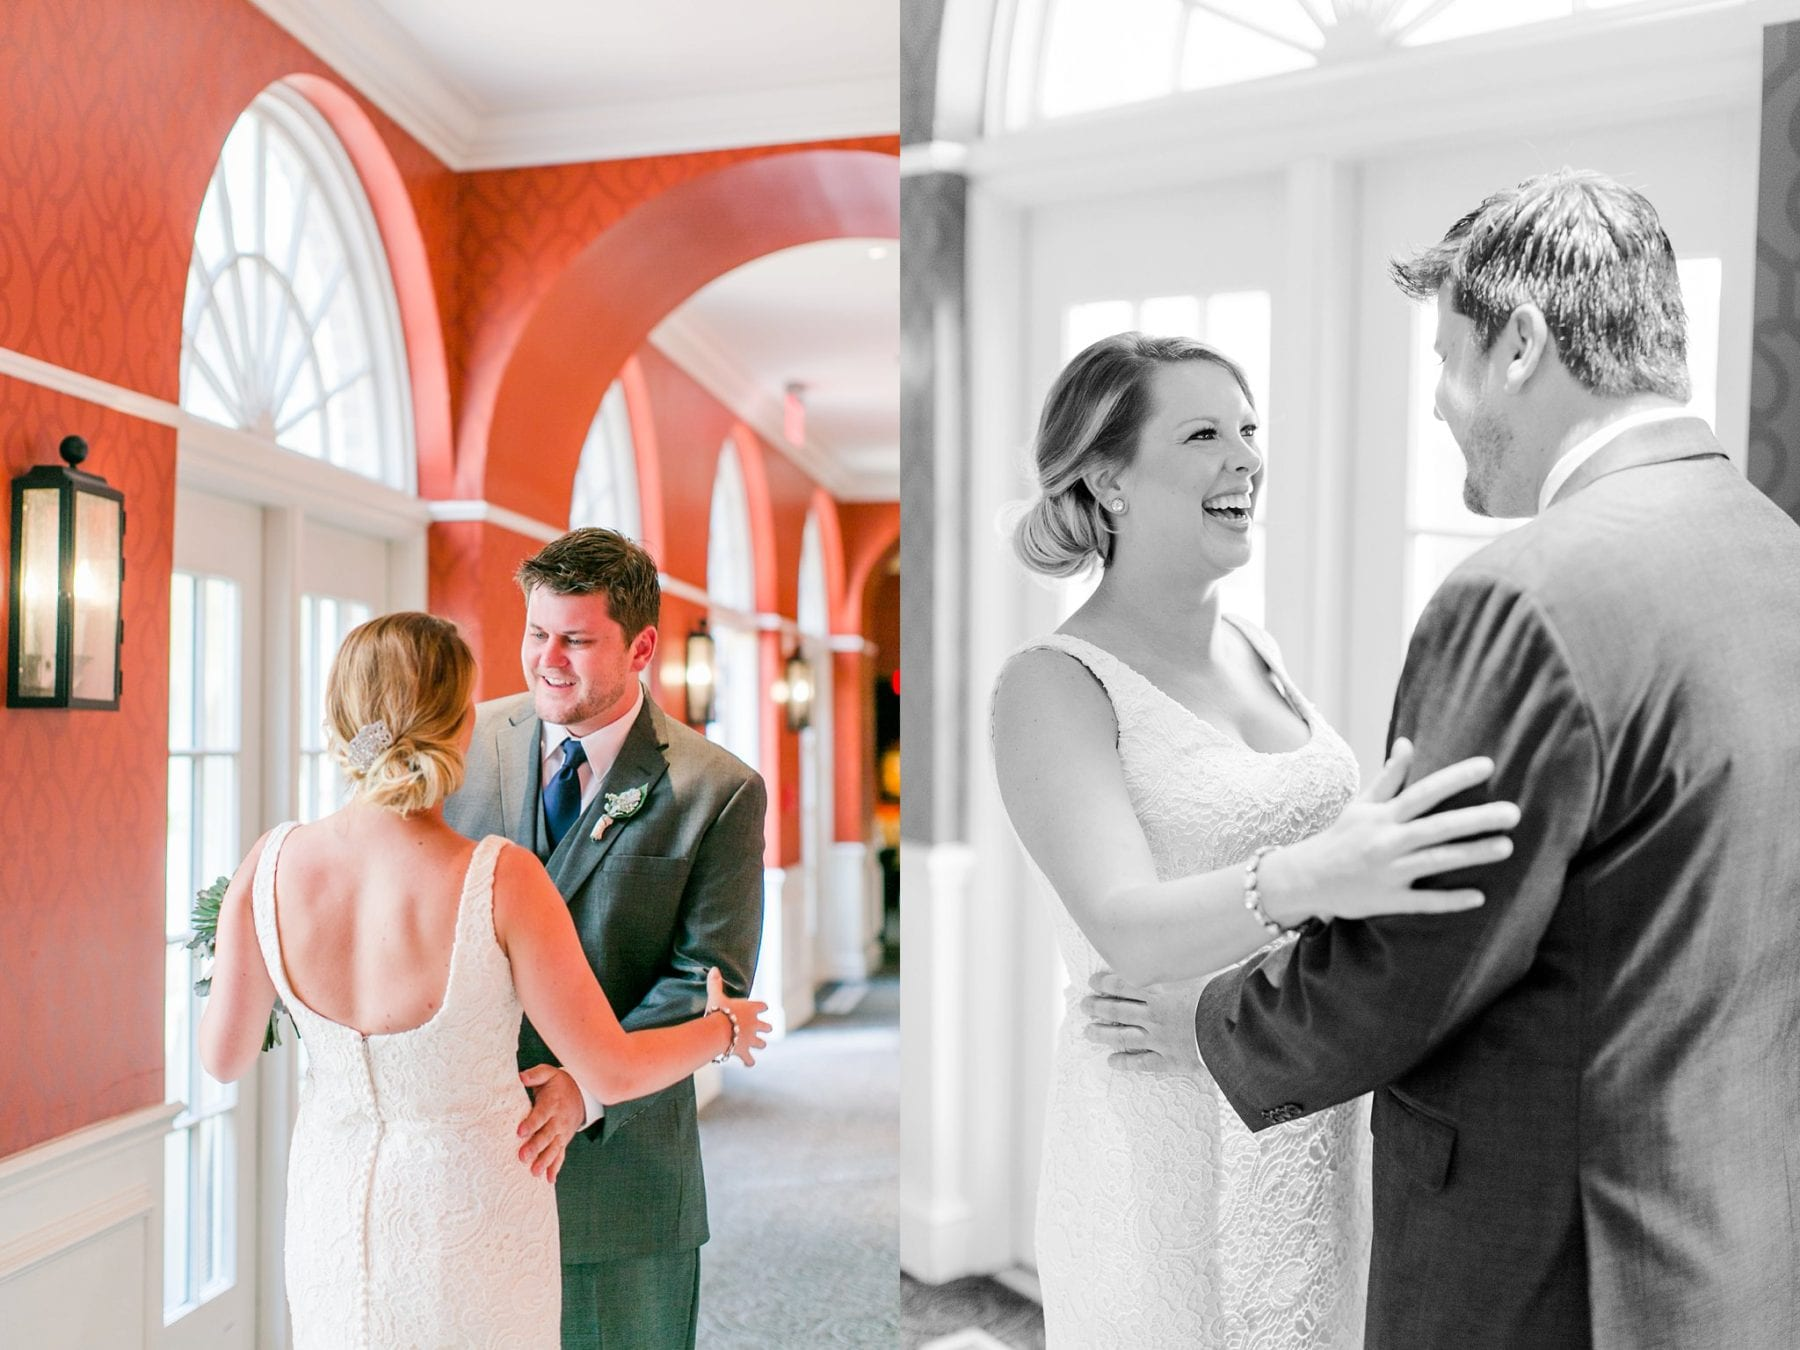 Hotel Monaco Wedding Photos Virginia Wedding Photographer Megan Kelsey Photography Kevin & Morgan-129.JPG